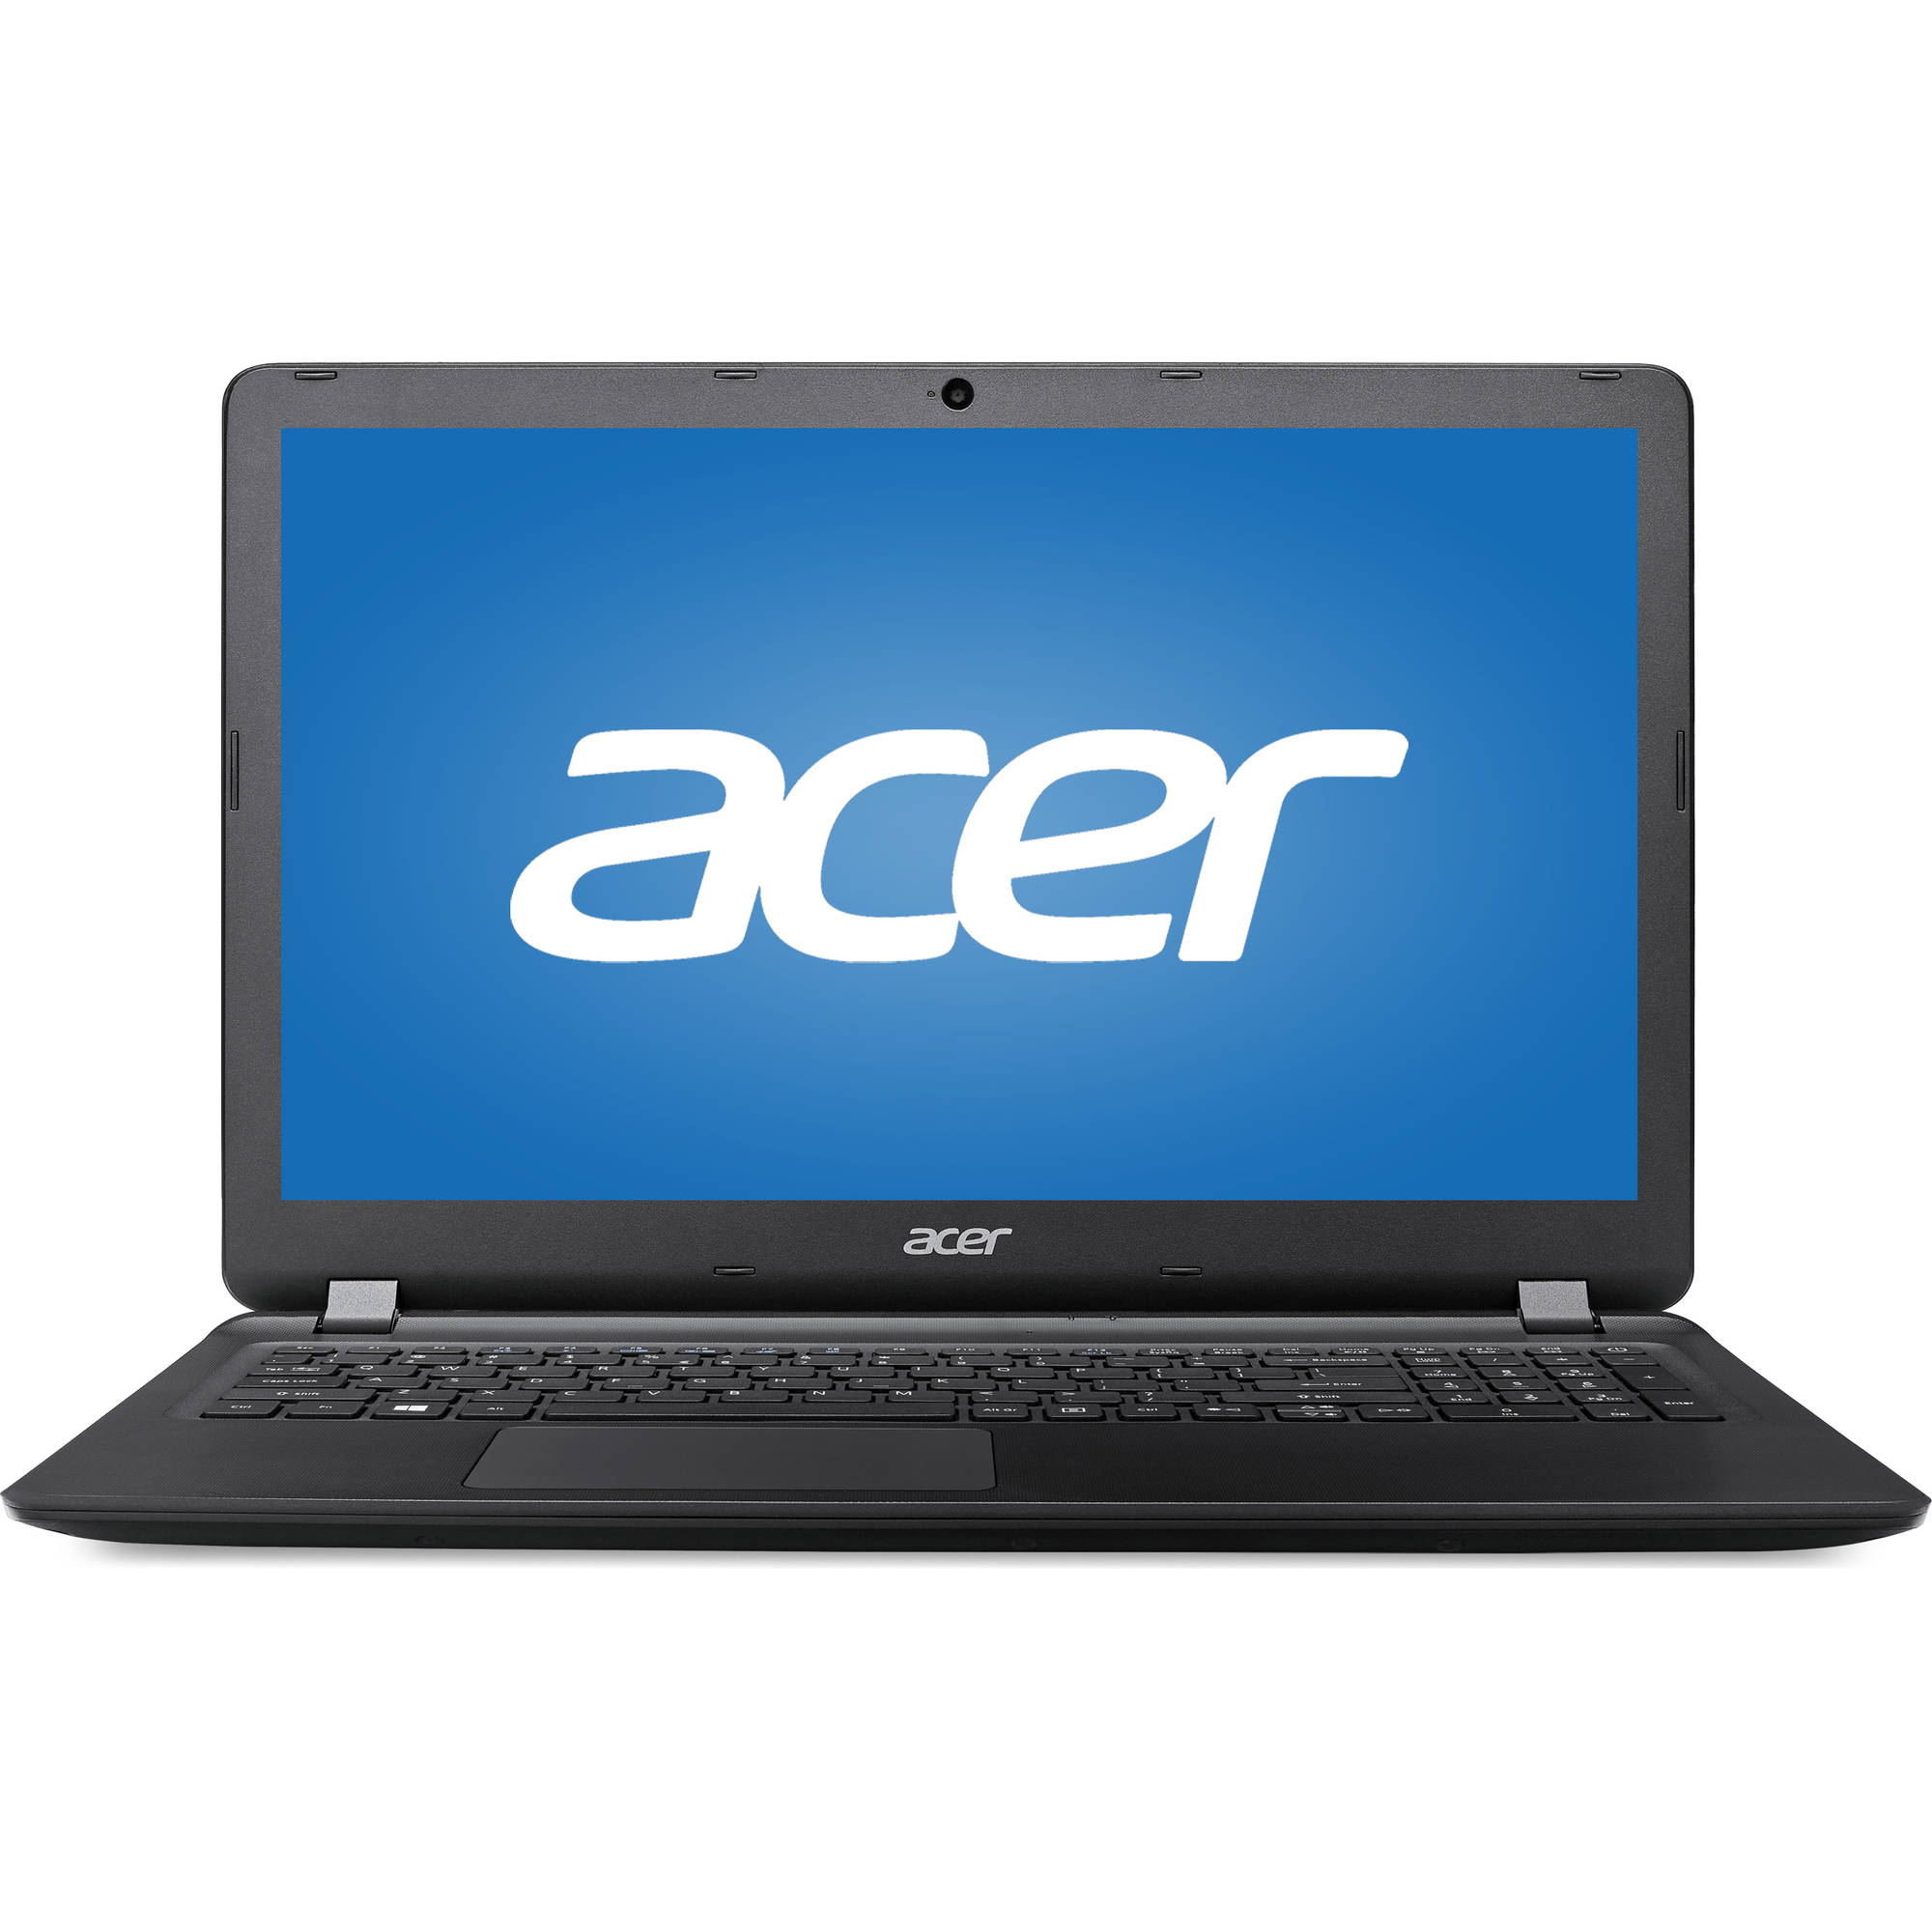 "Acer Aspire ES1-533-C3VD 15.6"" Laptop, Windows 10 Home, Intel Celeron N3350 Processor, 4GB RAM, 500GB Hard Drive"